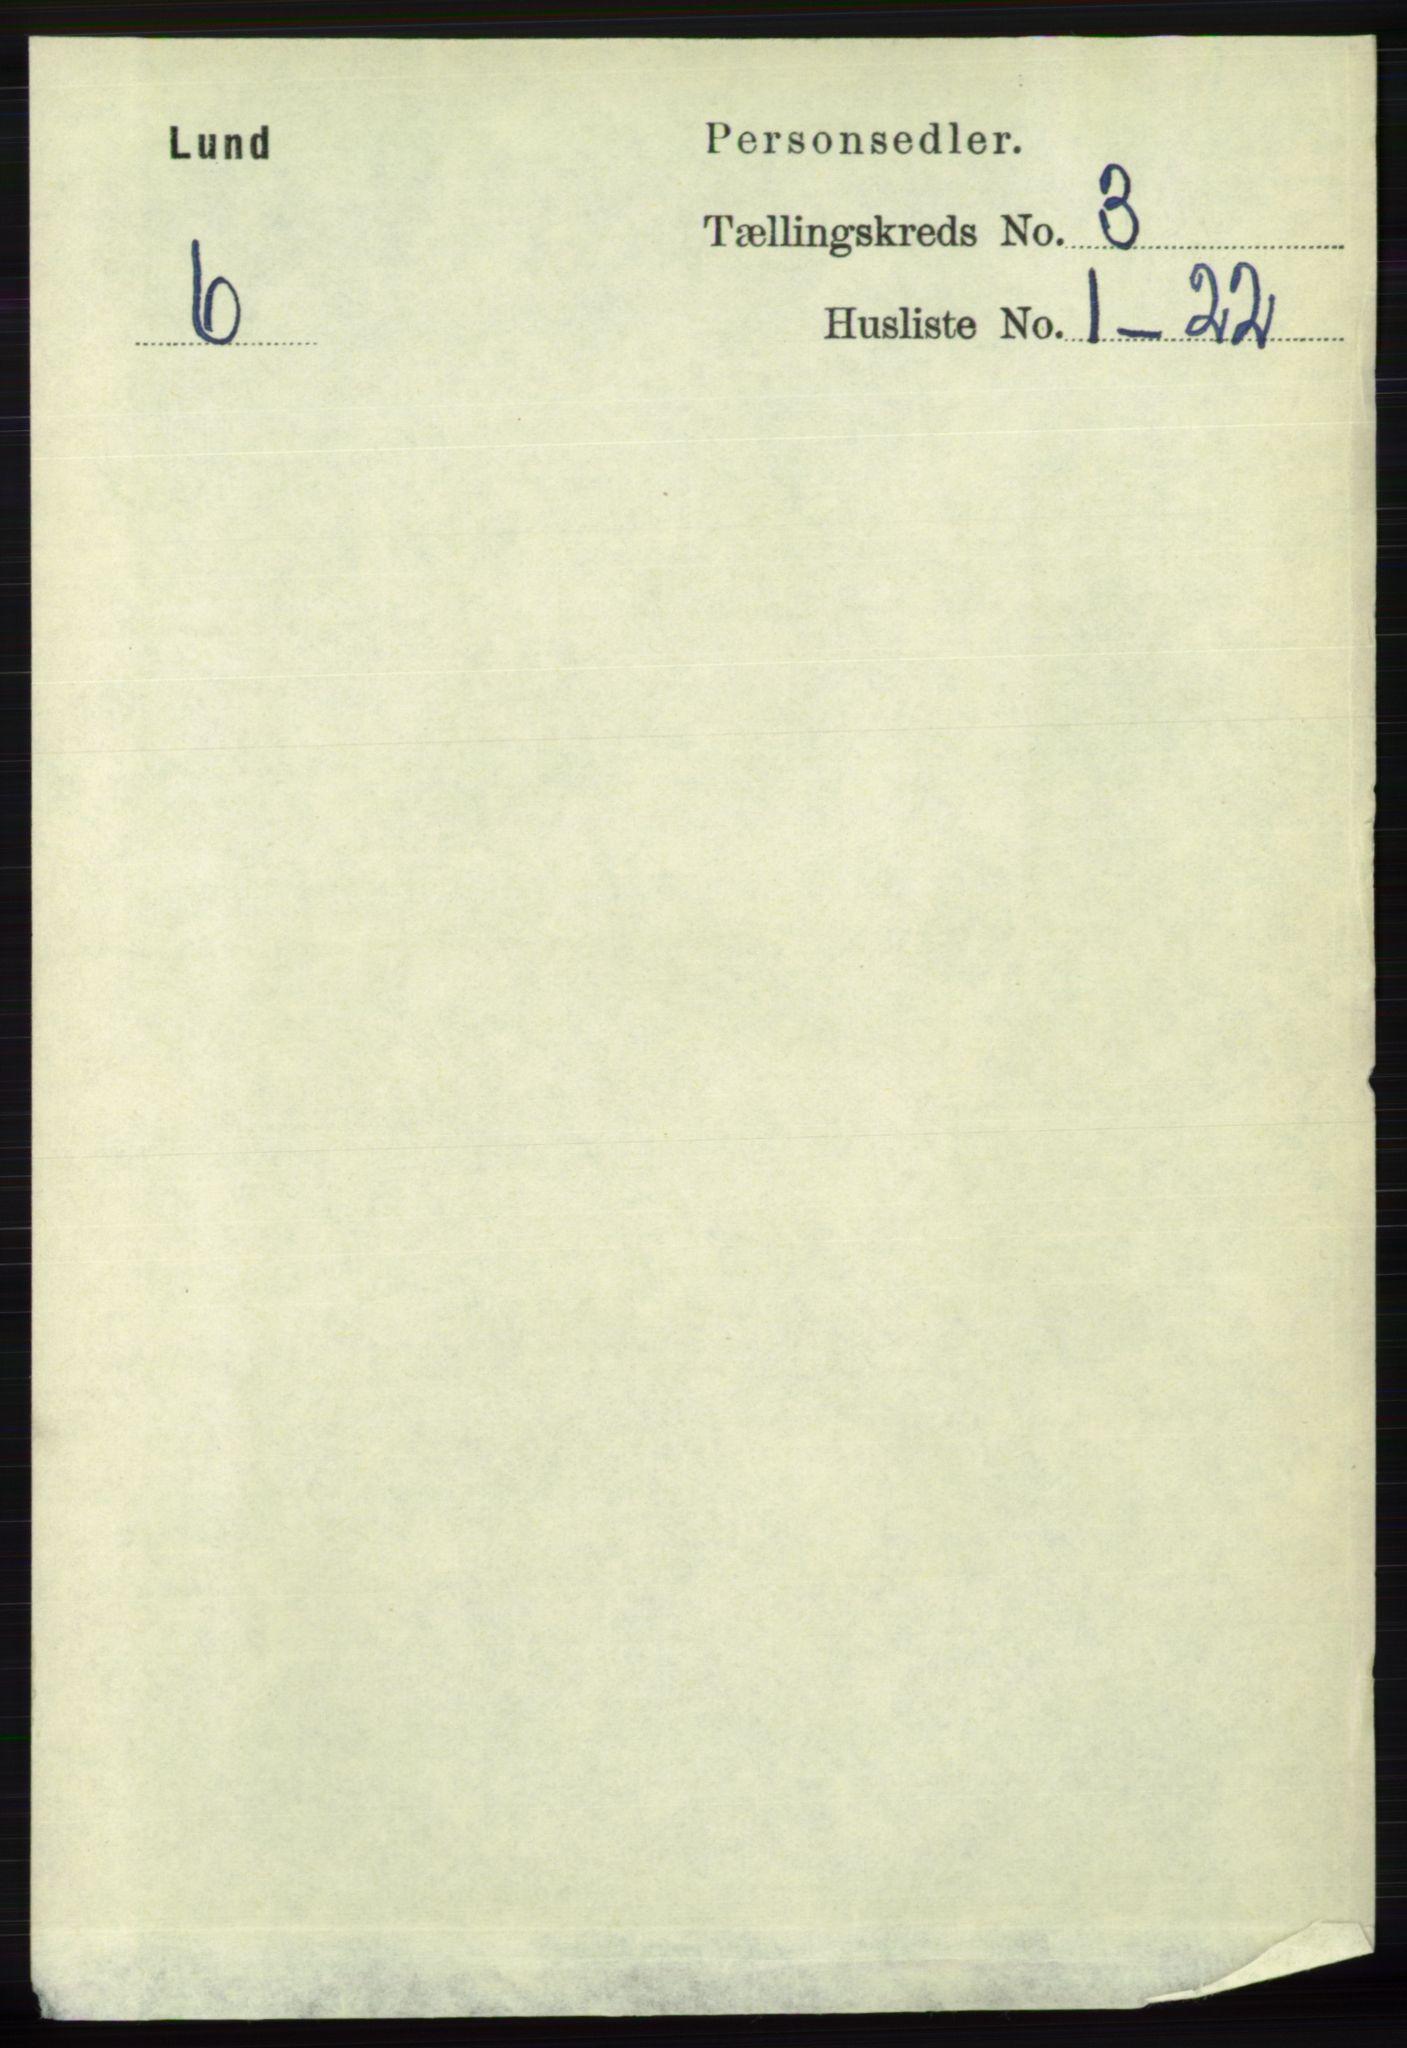 RA, Folketelling 1891 for 1112 Lund herred, 1891, s. 604